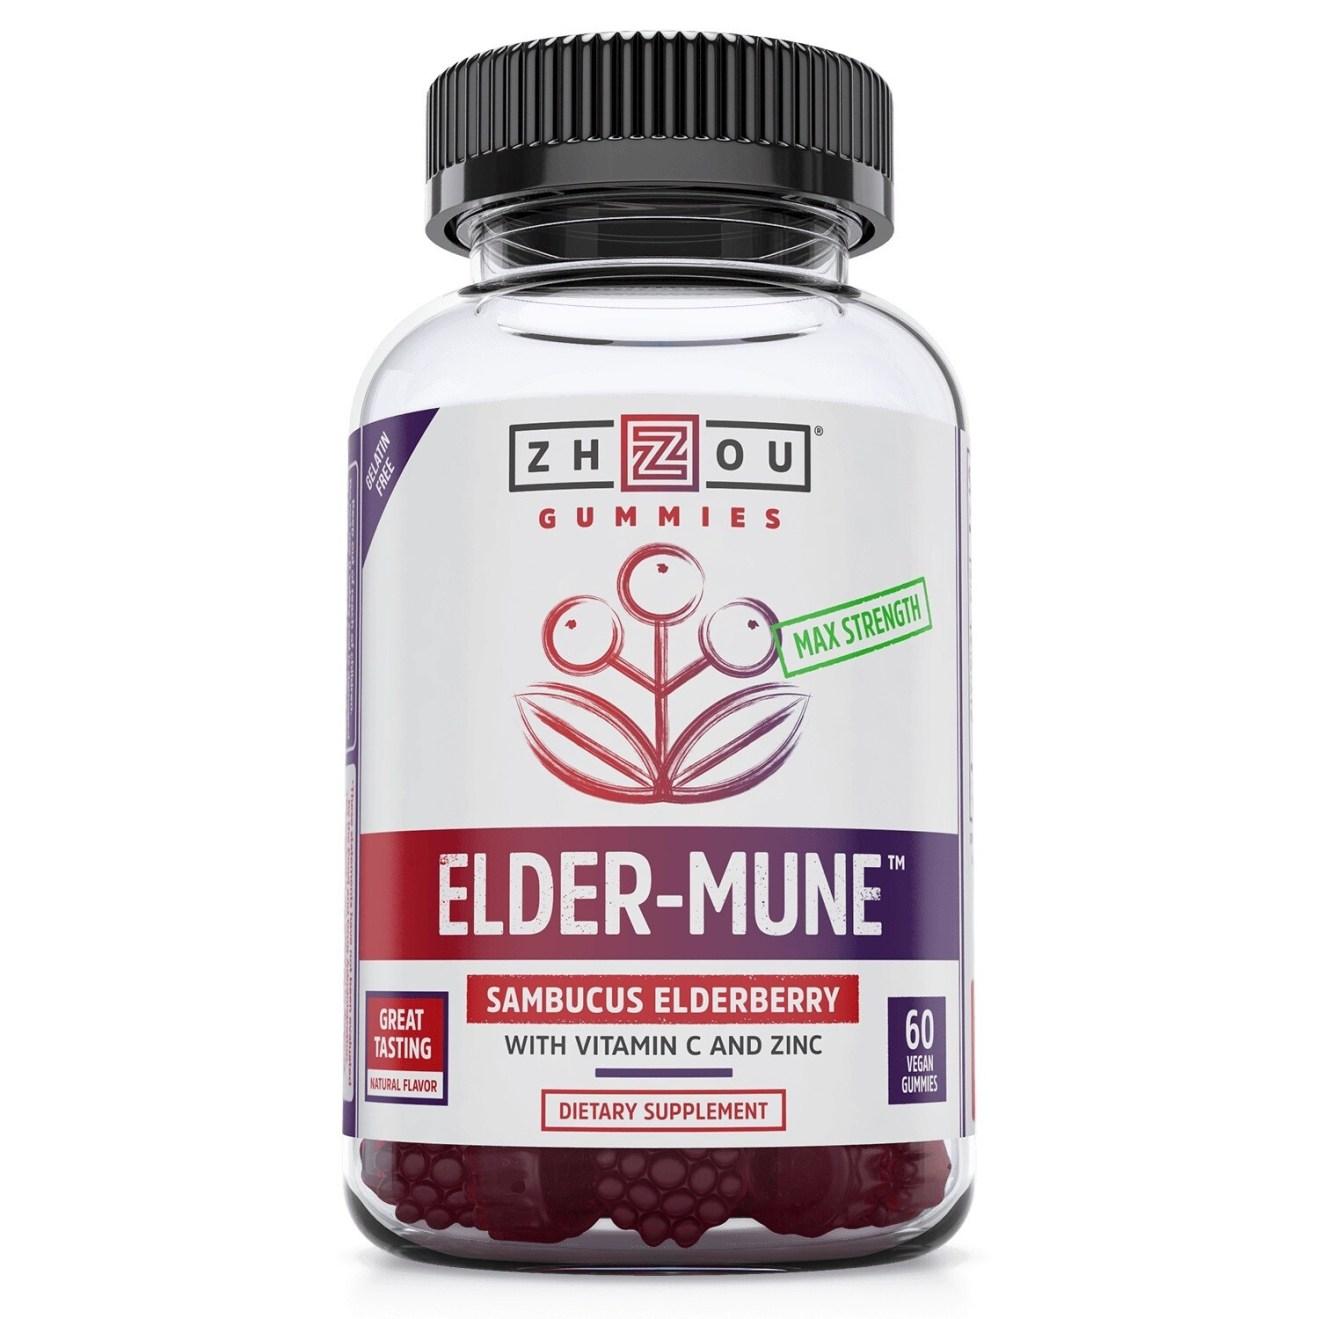 Elder-Mune